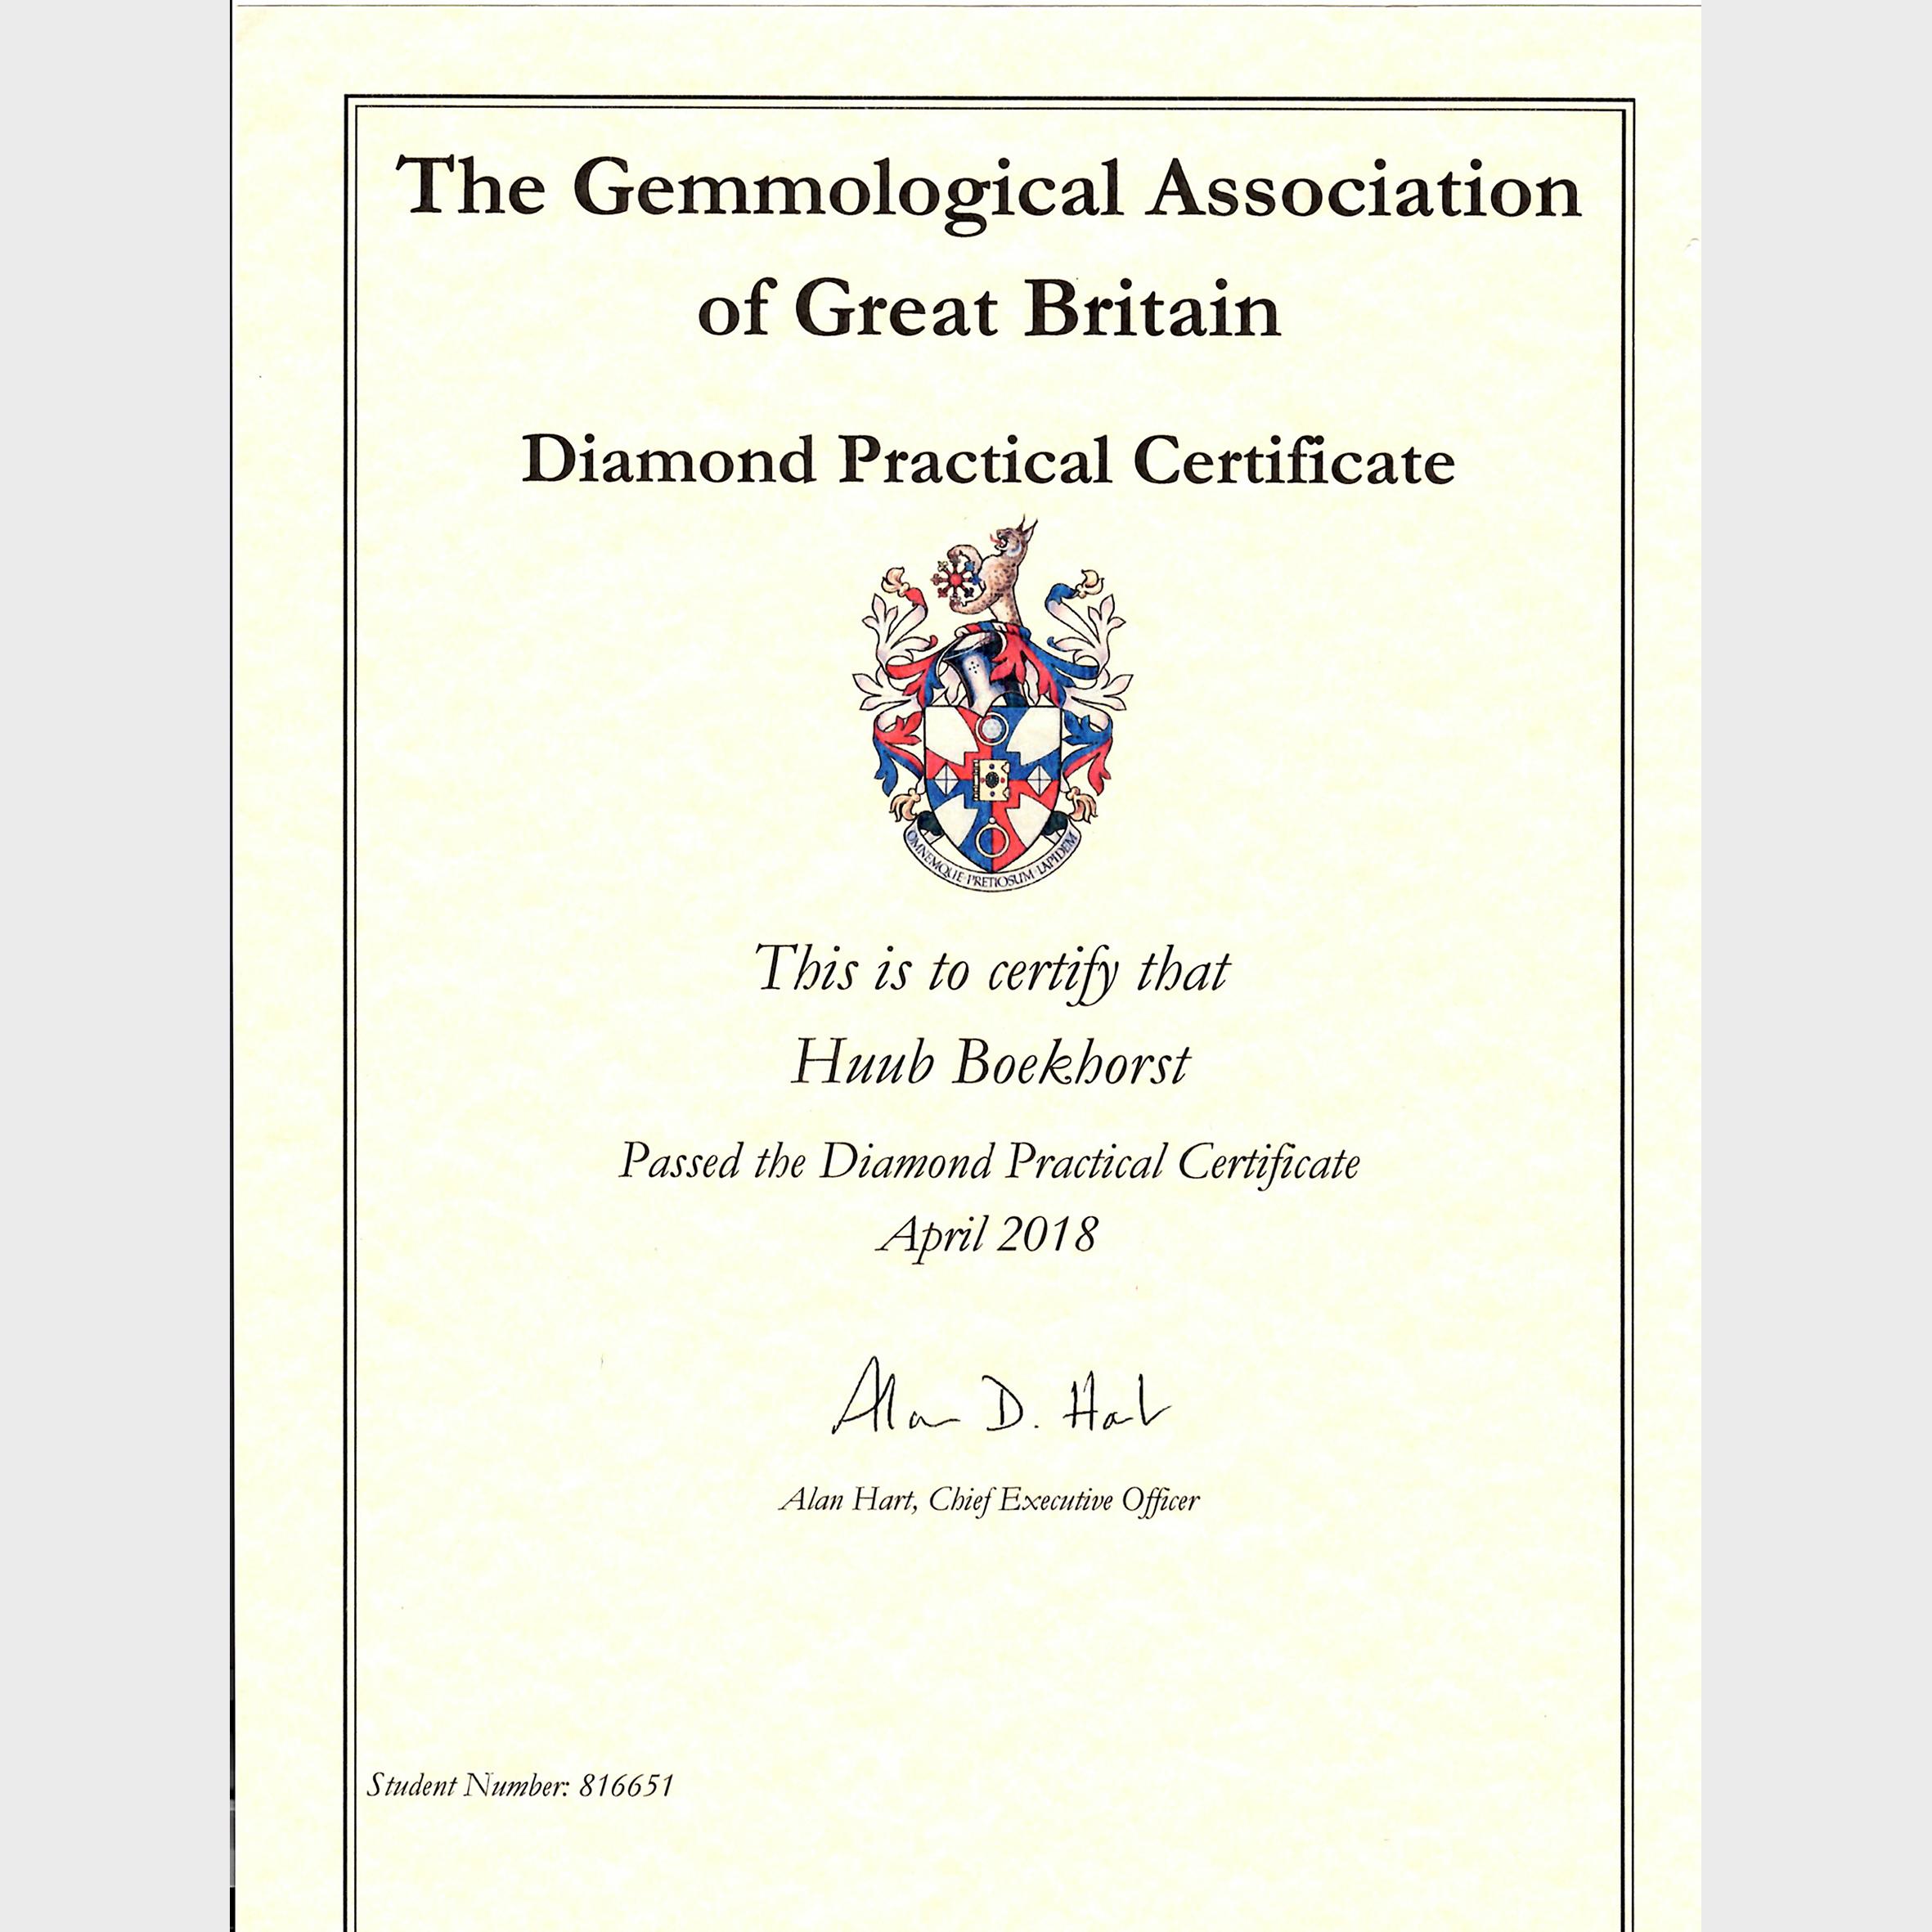 Gem-A Diamond Grading Certificate